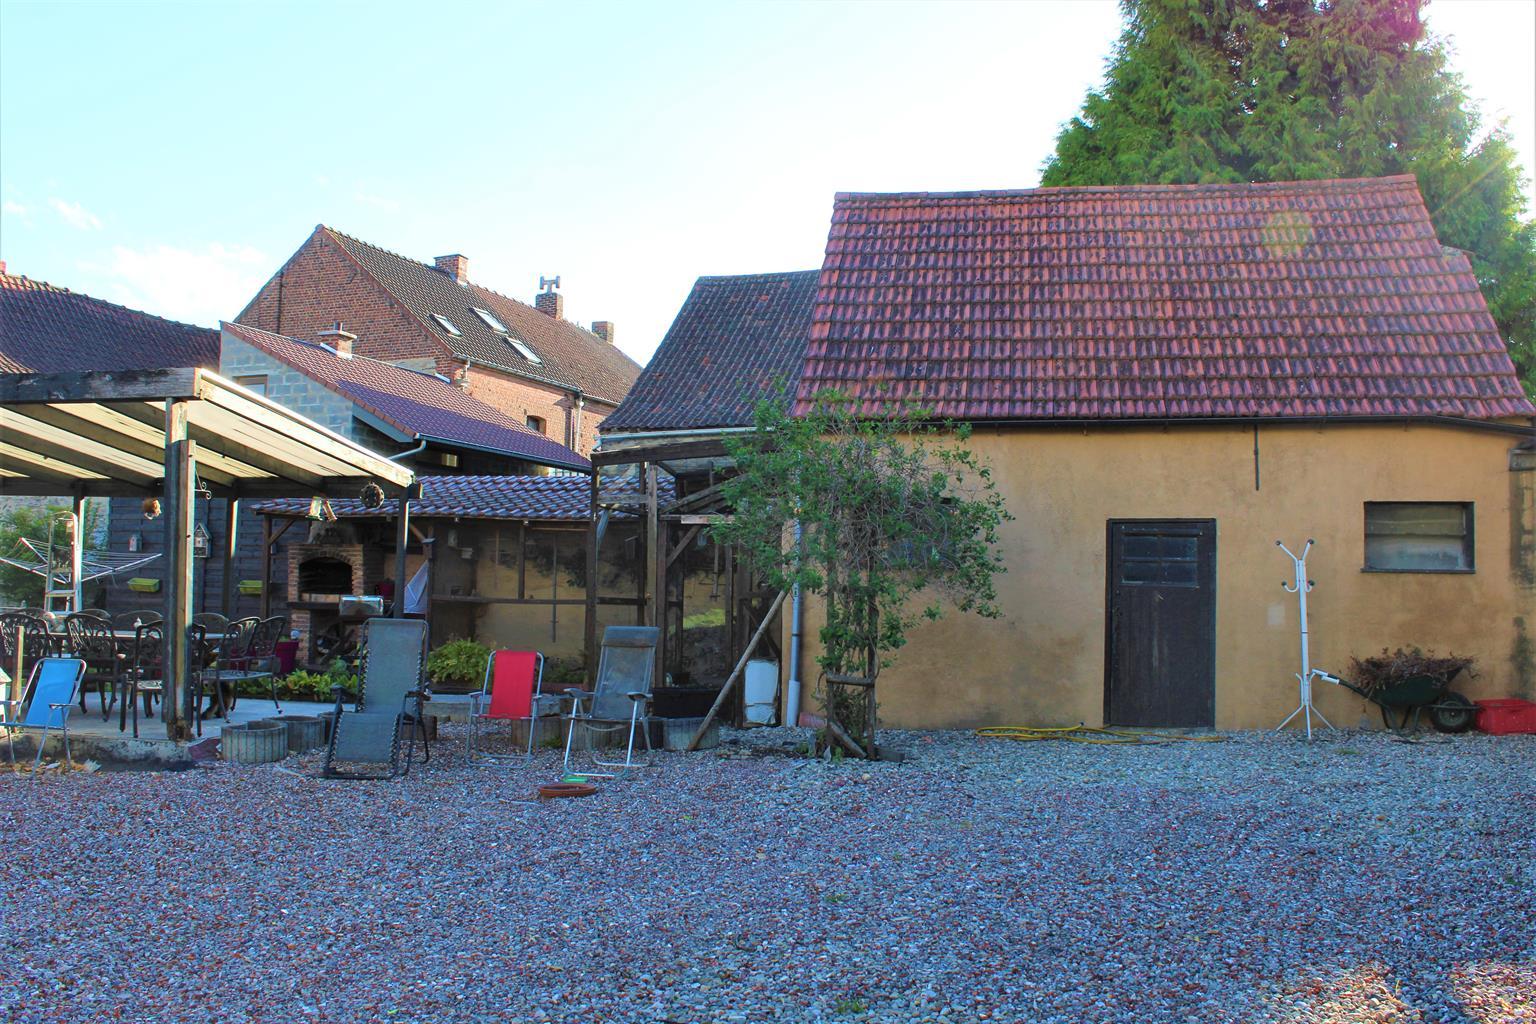 Maison - Antoing Calonne - #4297159-2